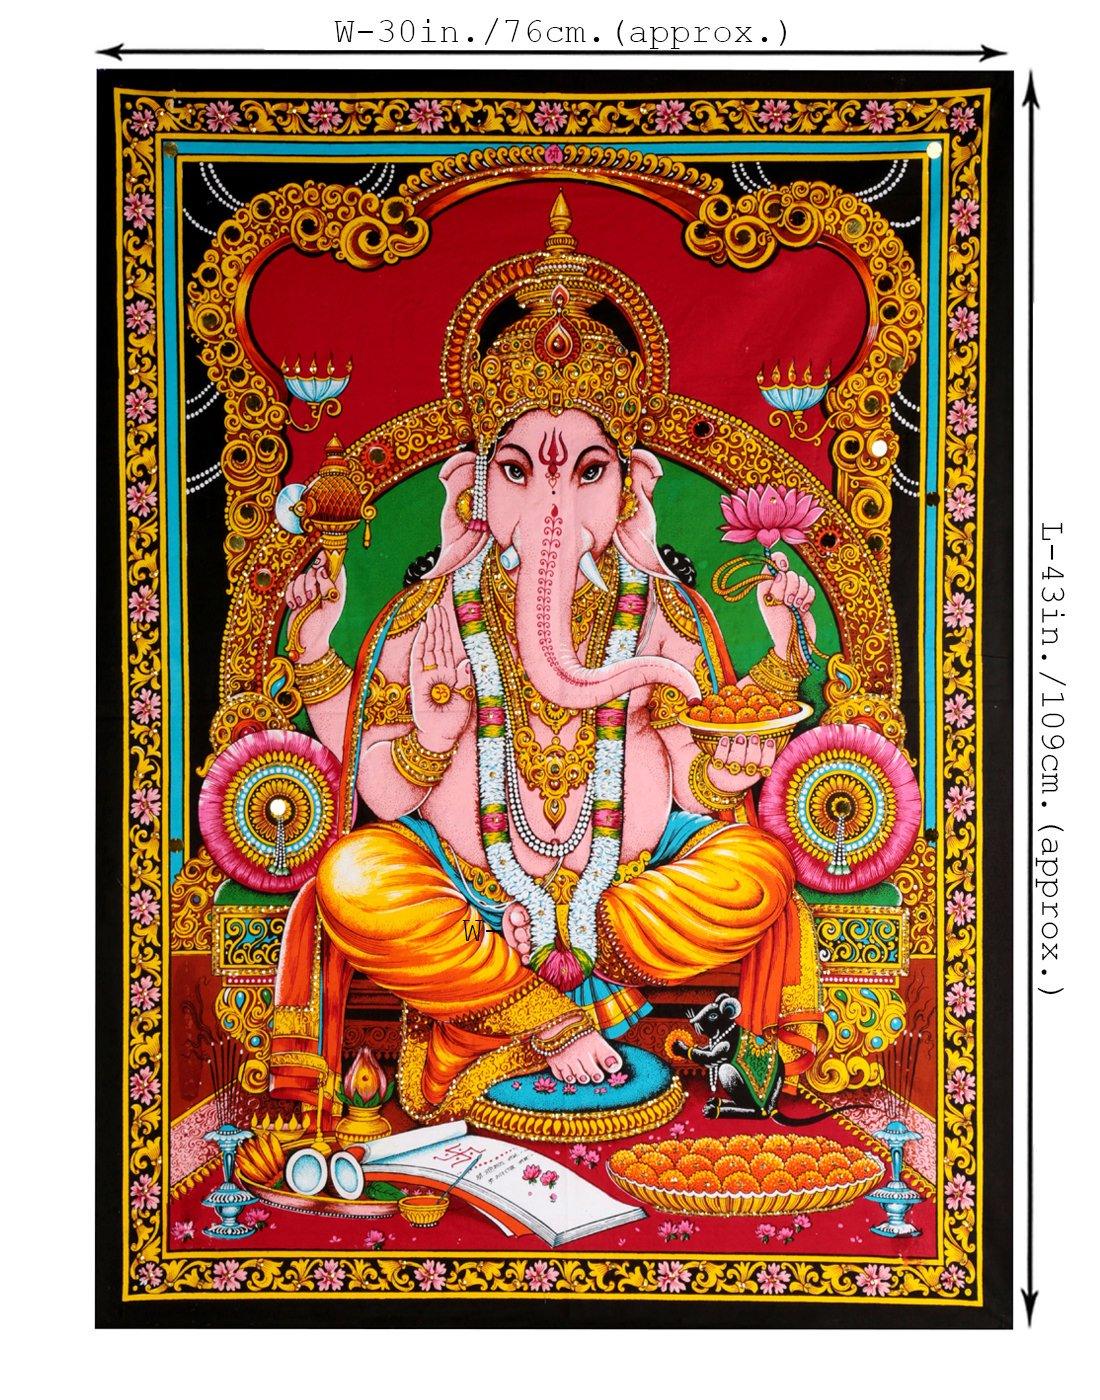 RAJRANG Tapestry Etnici Tapis Lord Ganesha Cotone Parete Ganesh appesa